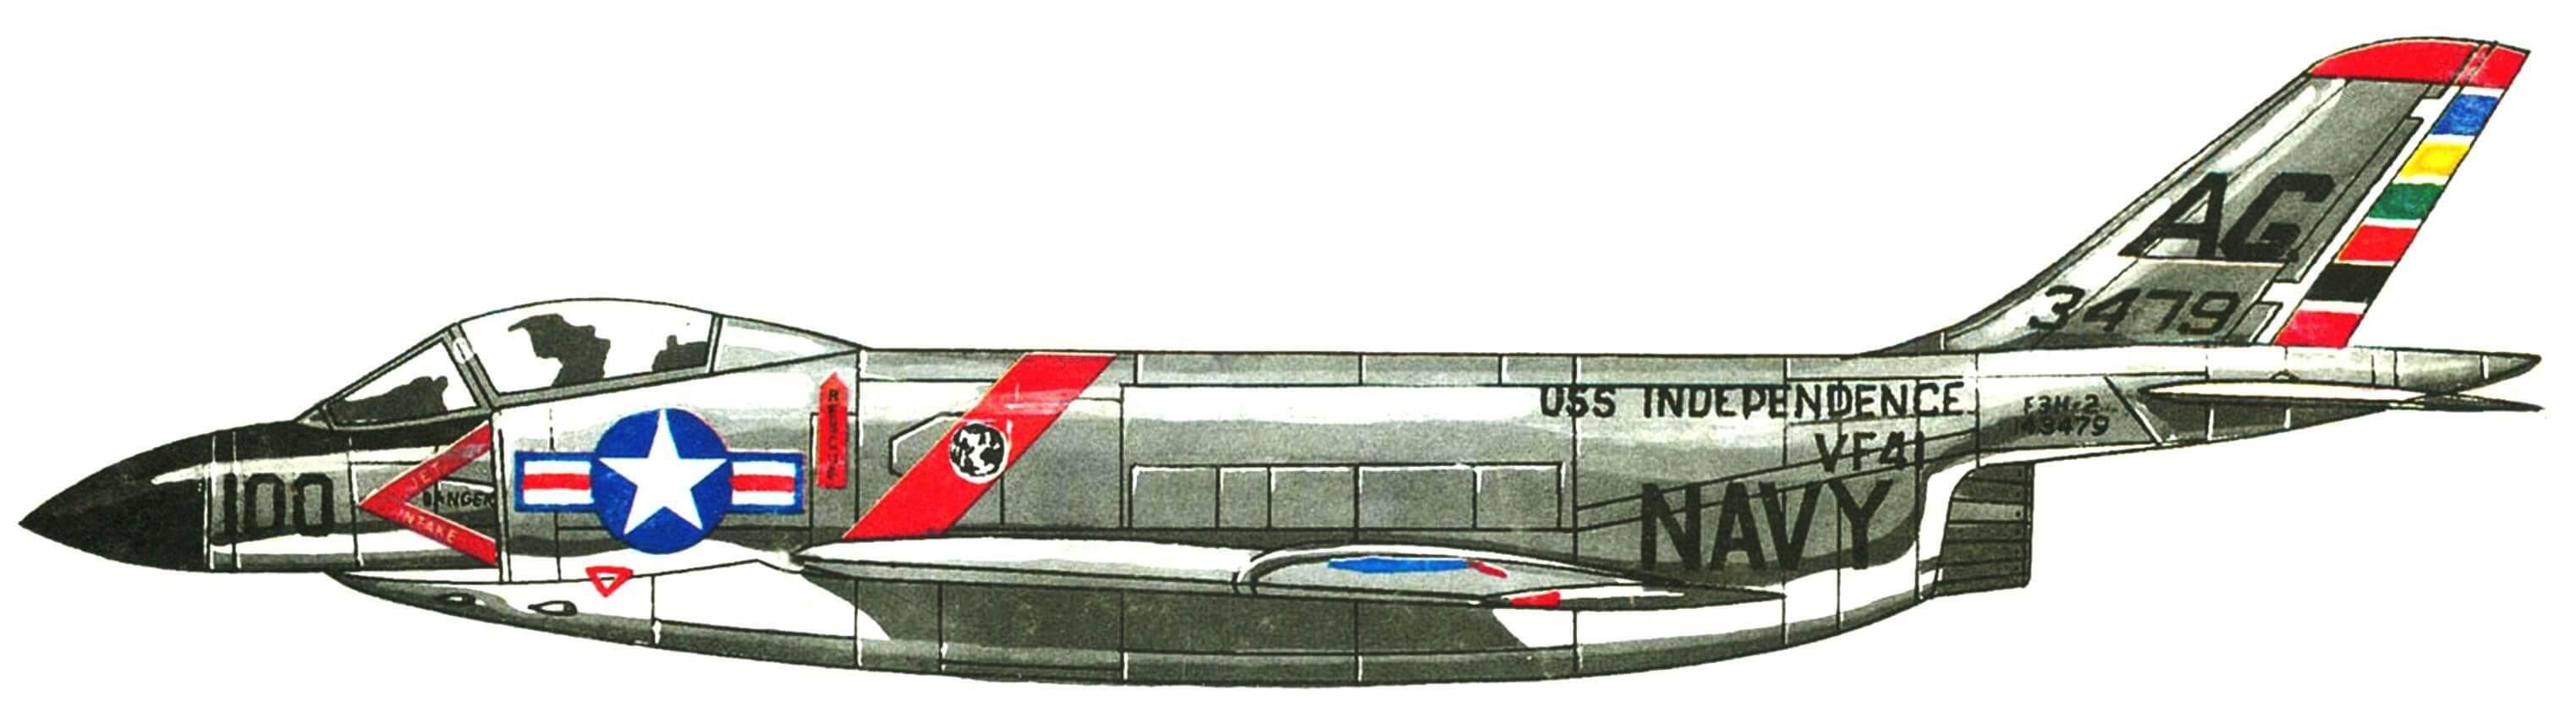 F-3В эскадрильи VF-41 «Black Aces» авианосец «Independence», 1959 г.